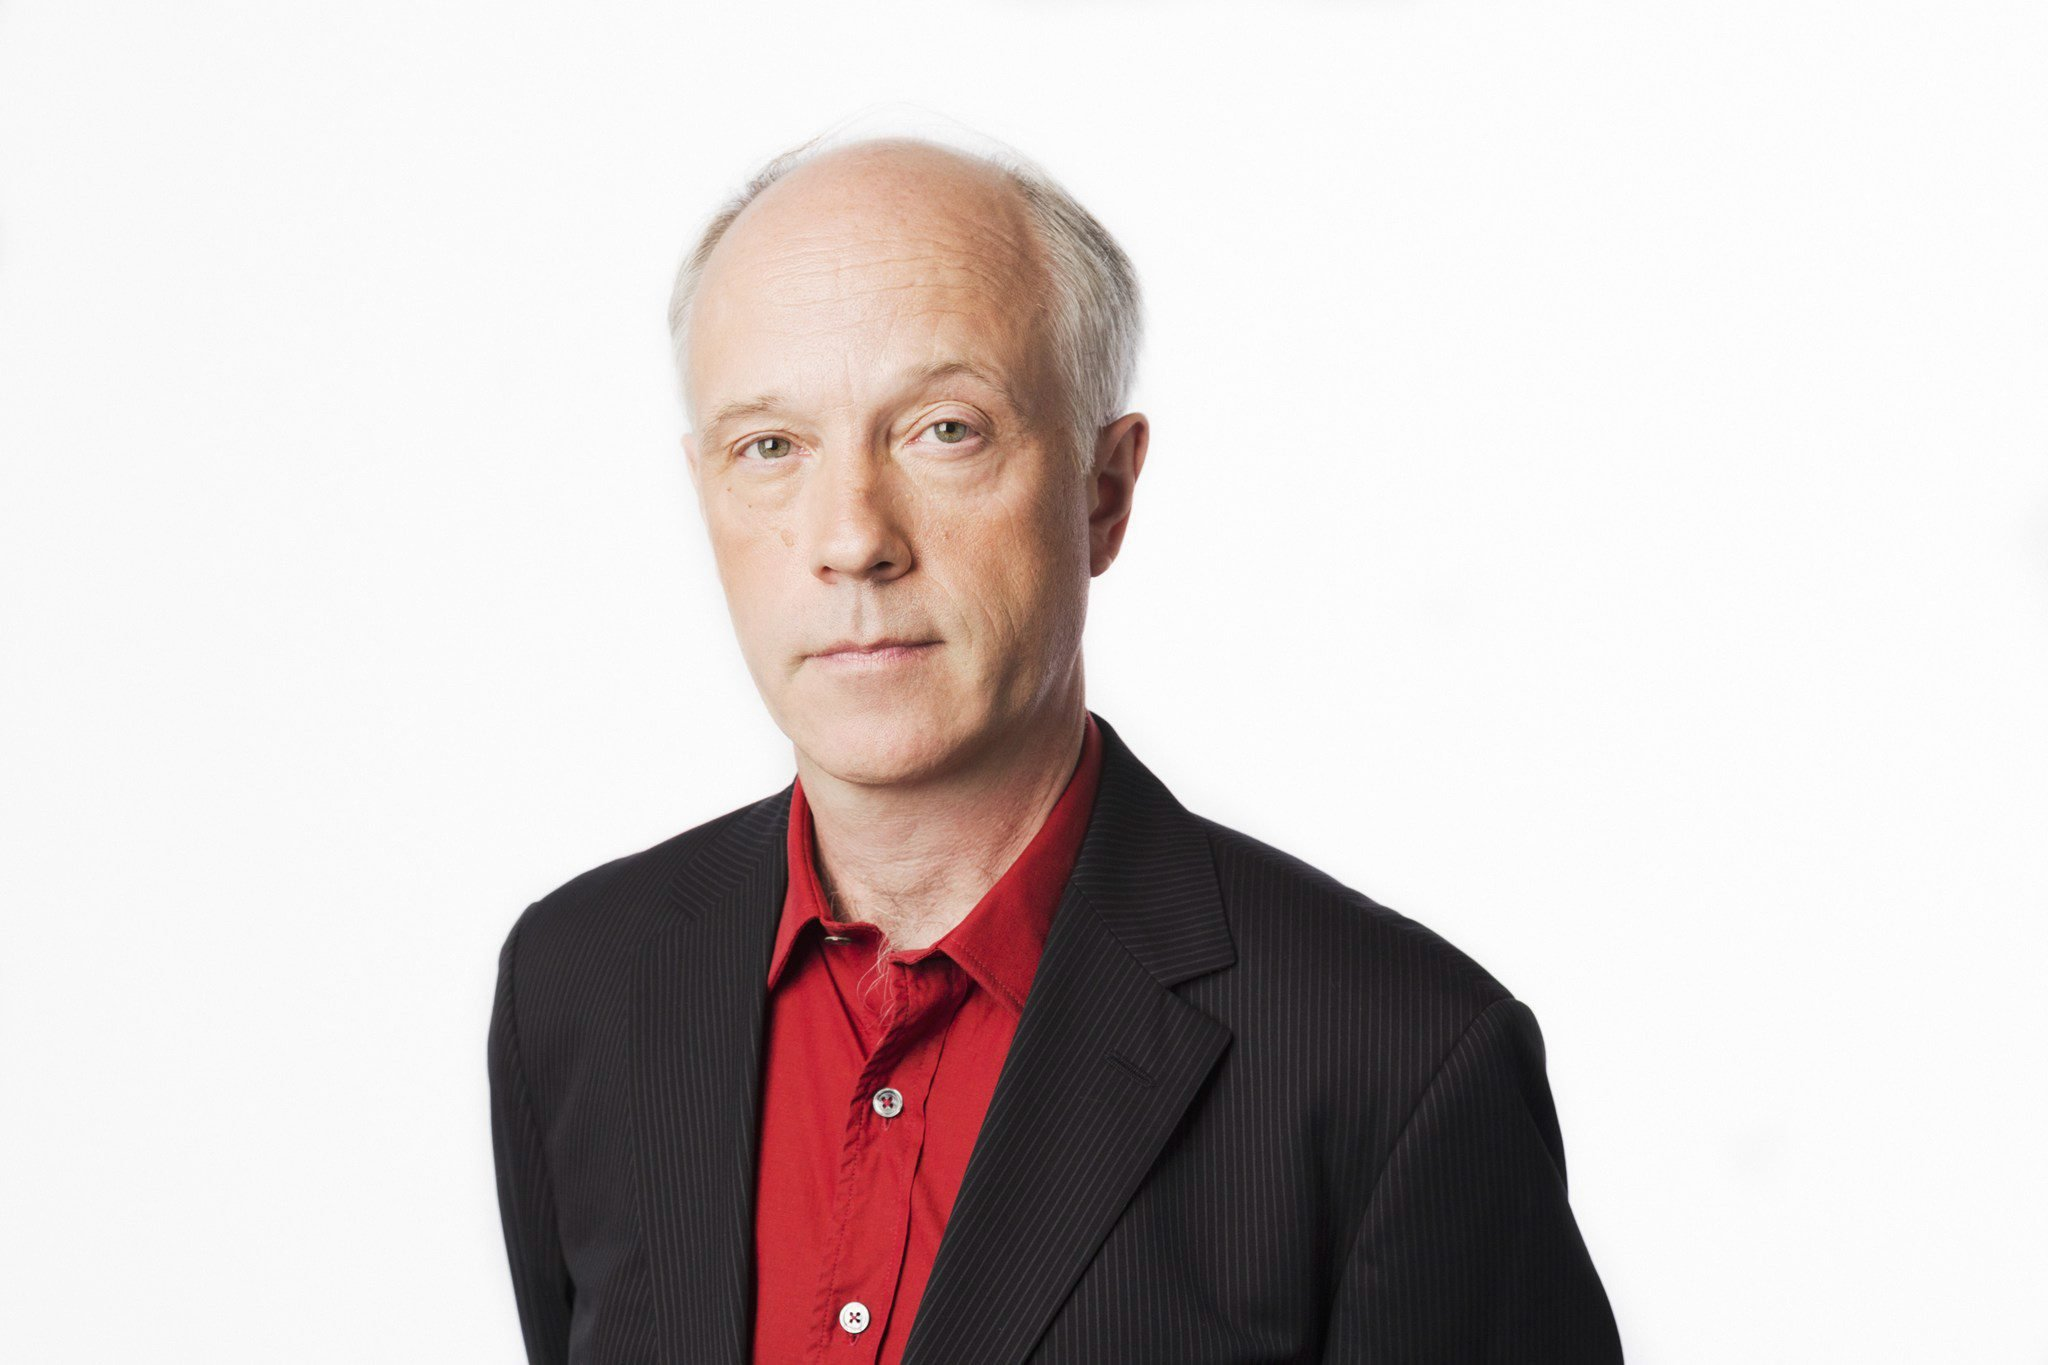 Swedish journalist Nils Horner.